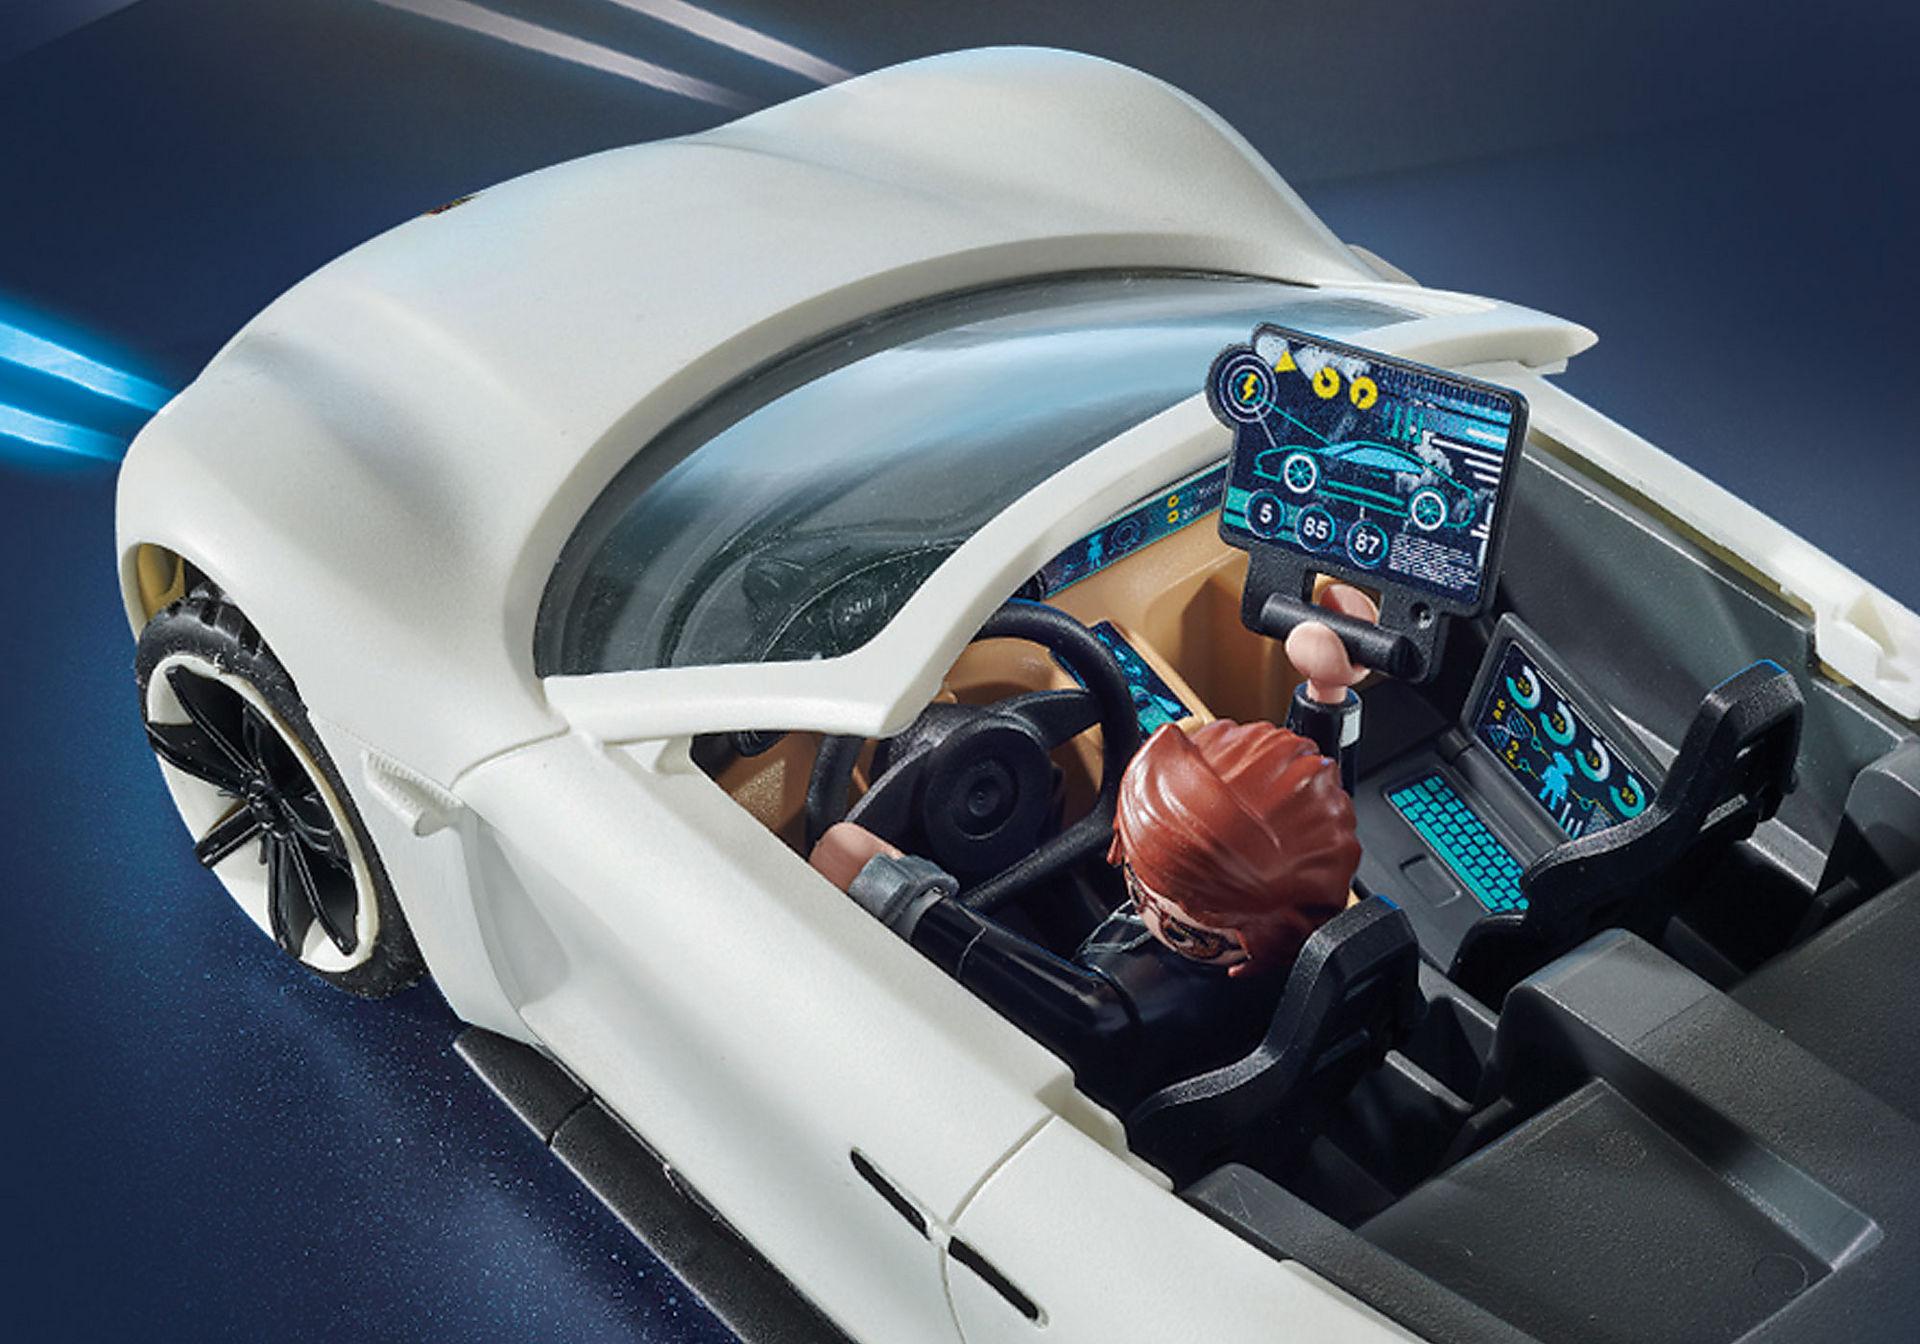 http://media.playmobil.com/i/playmobil/70078_product_extra4/PLAYMOBIL:THE MOVIE Rex Dasher's Porsche Mission E